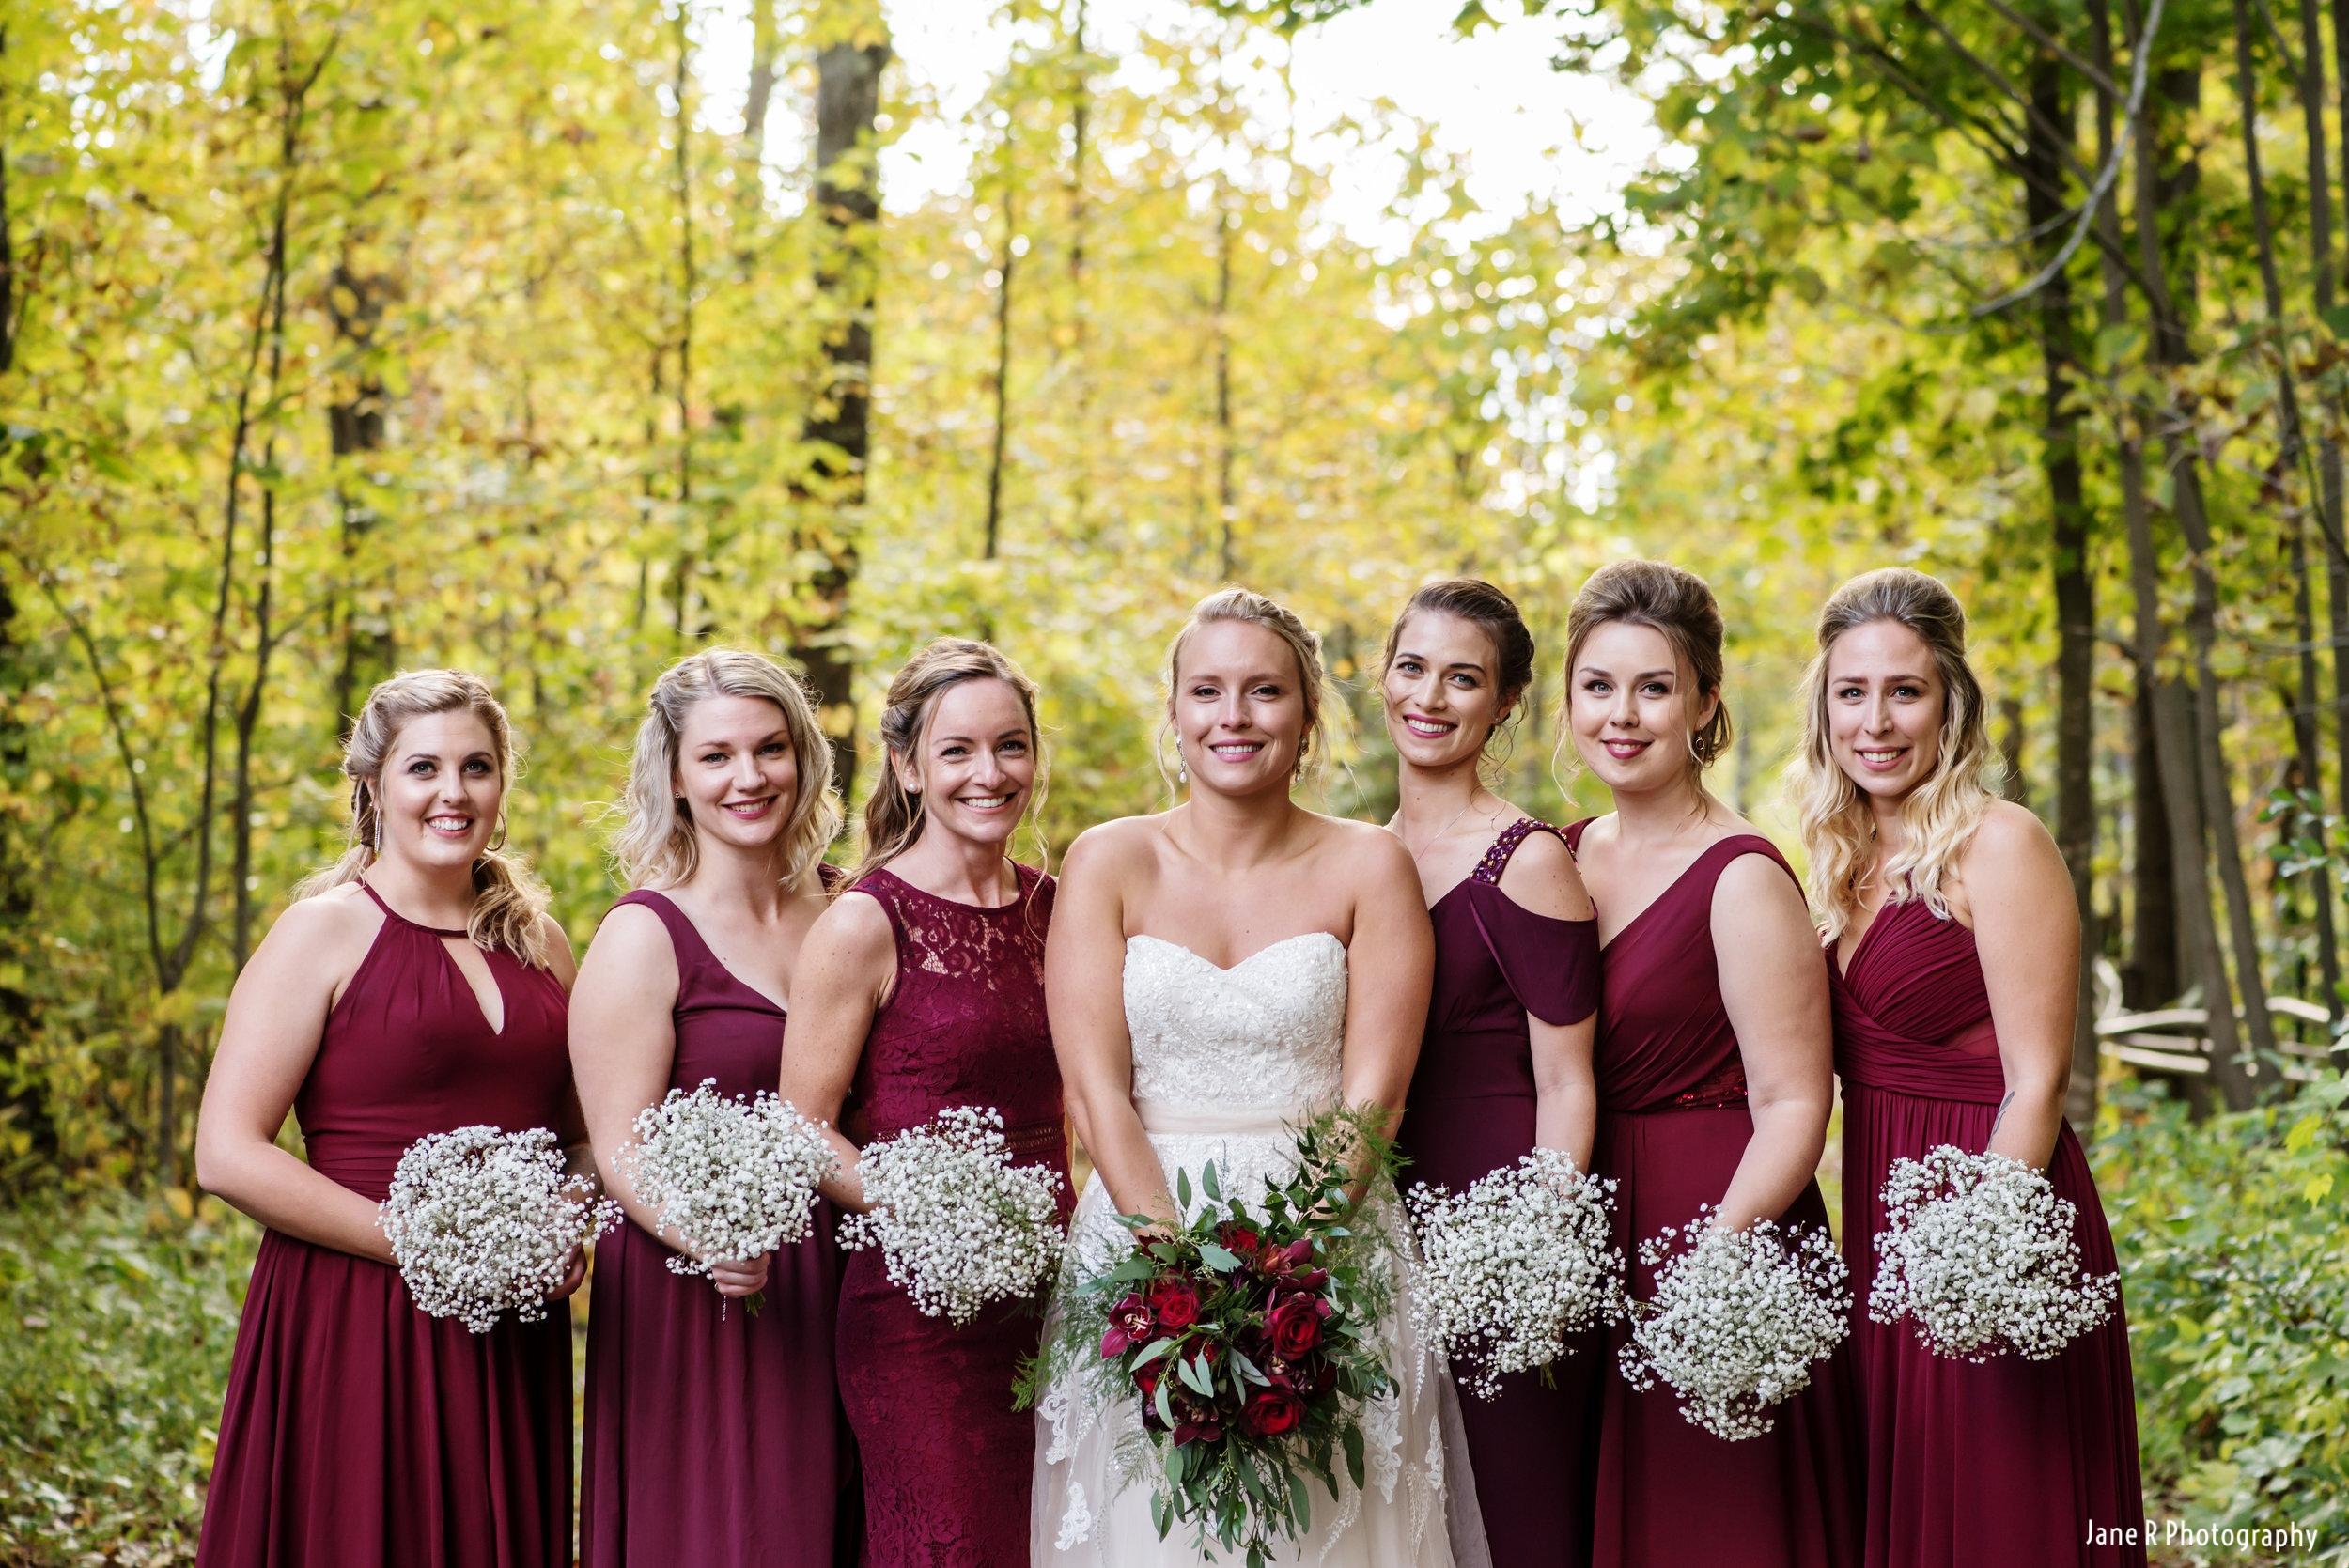 Ally&Dan_Wedding_byJaneRPhotography_384.jpg